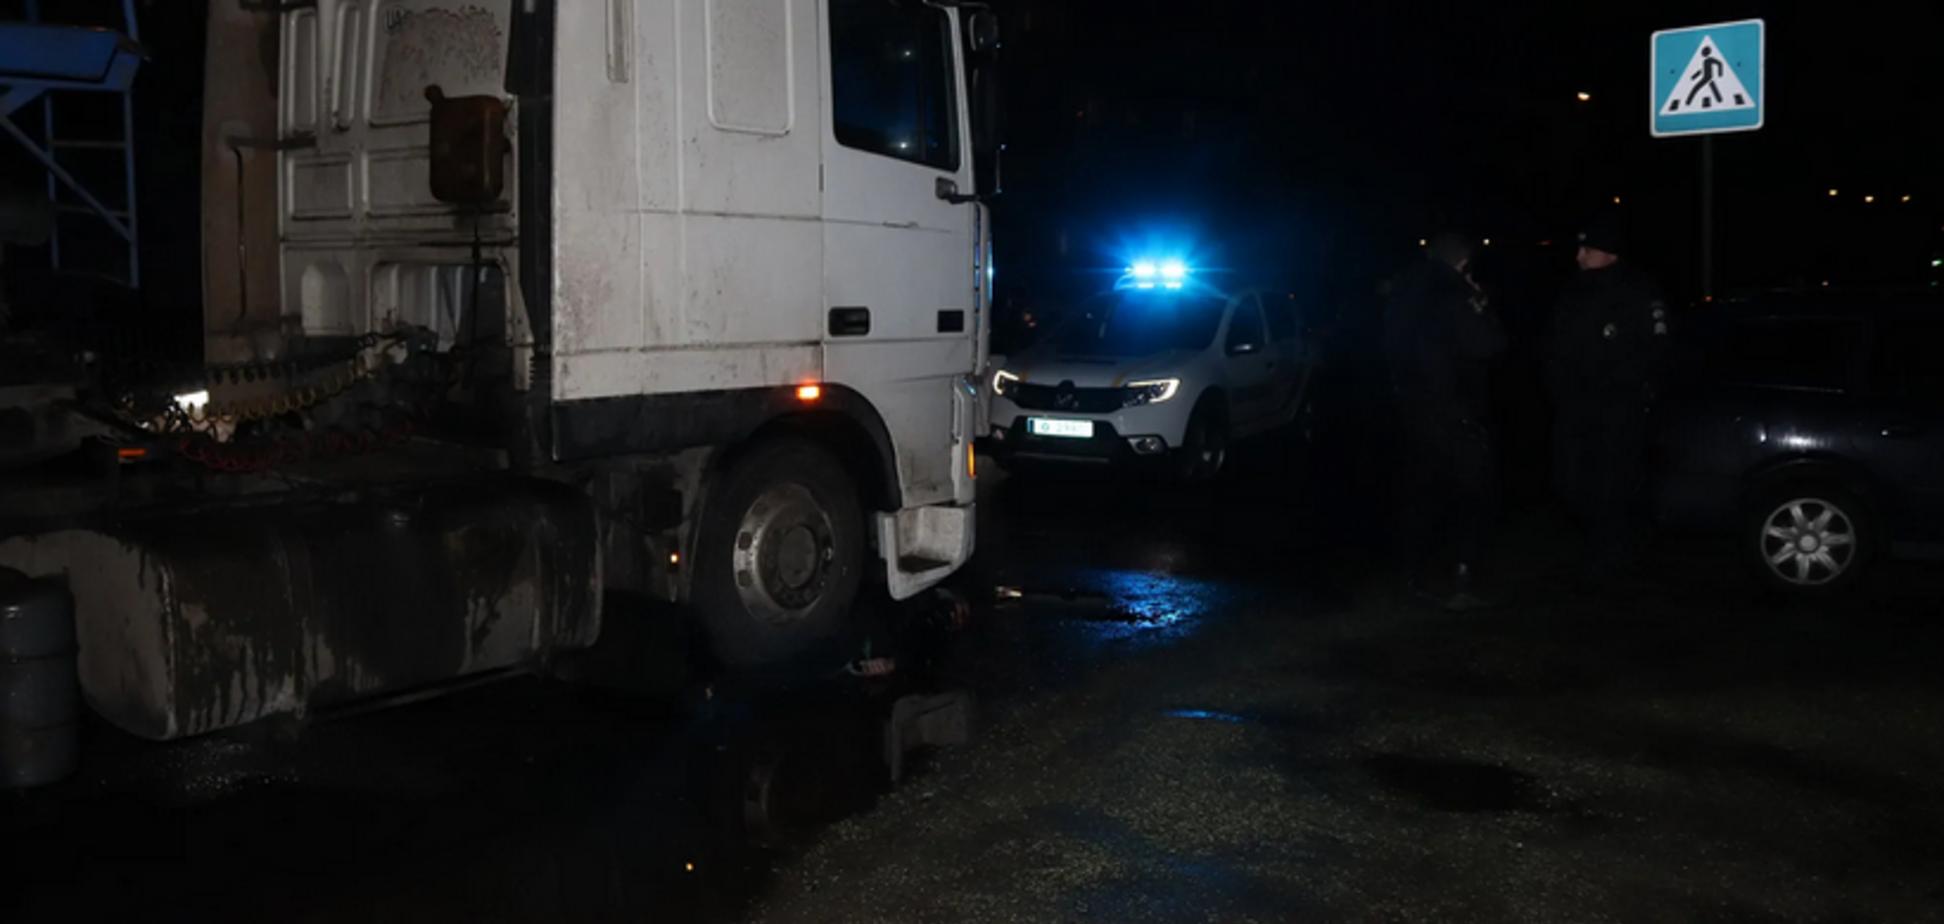 На Днепропетровщине фура сбила мужчину: фото 18+